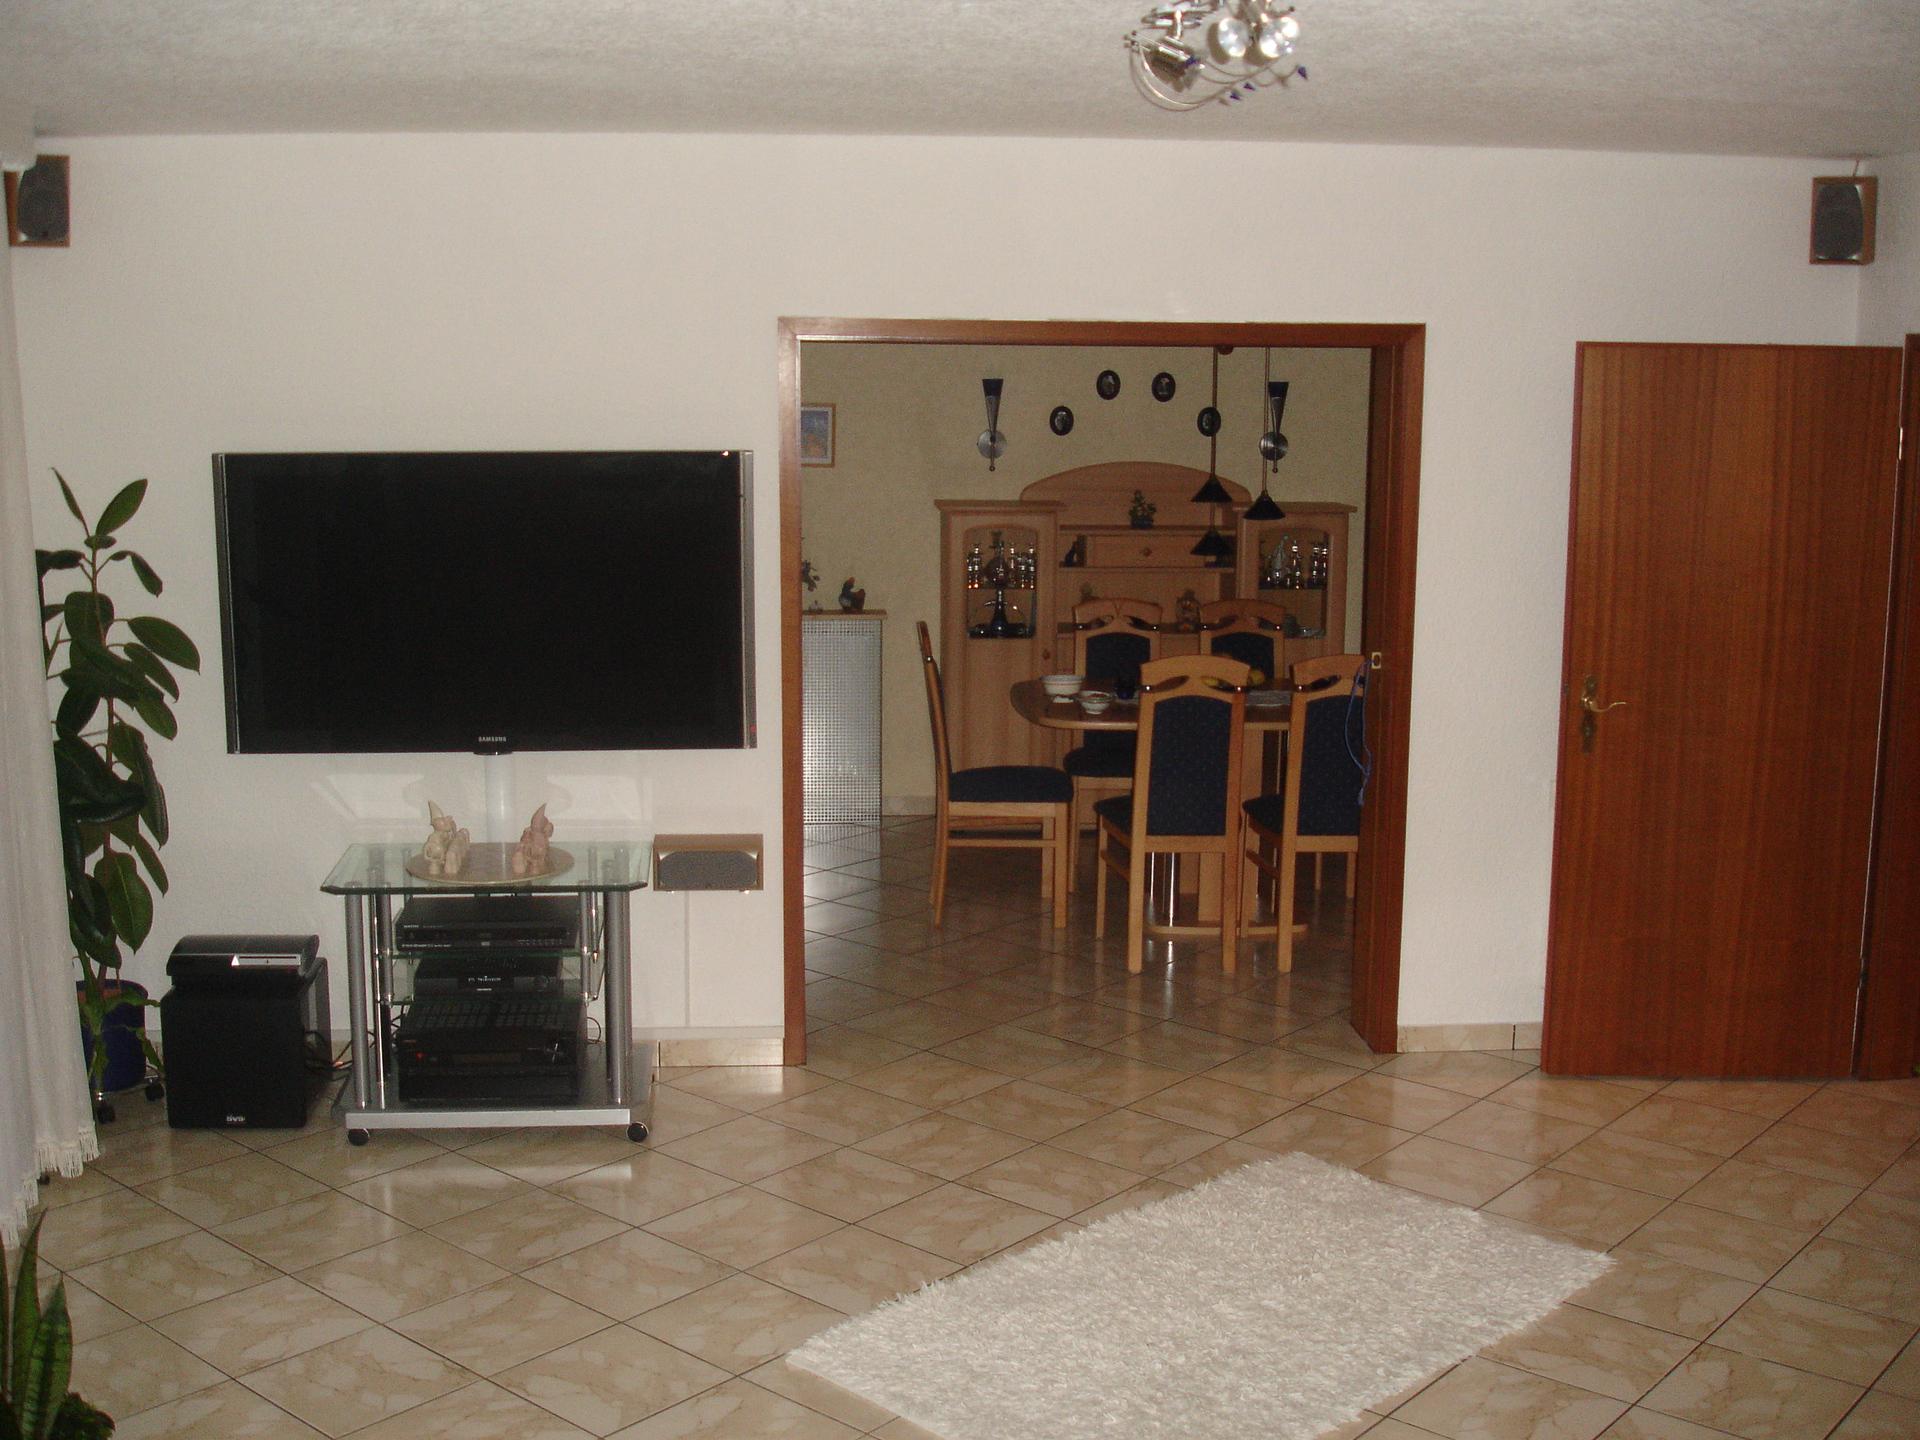 dsc09134 hifi bildergalerie. Black Bedroom Furniture Sets. Home Design Ideas